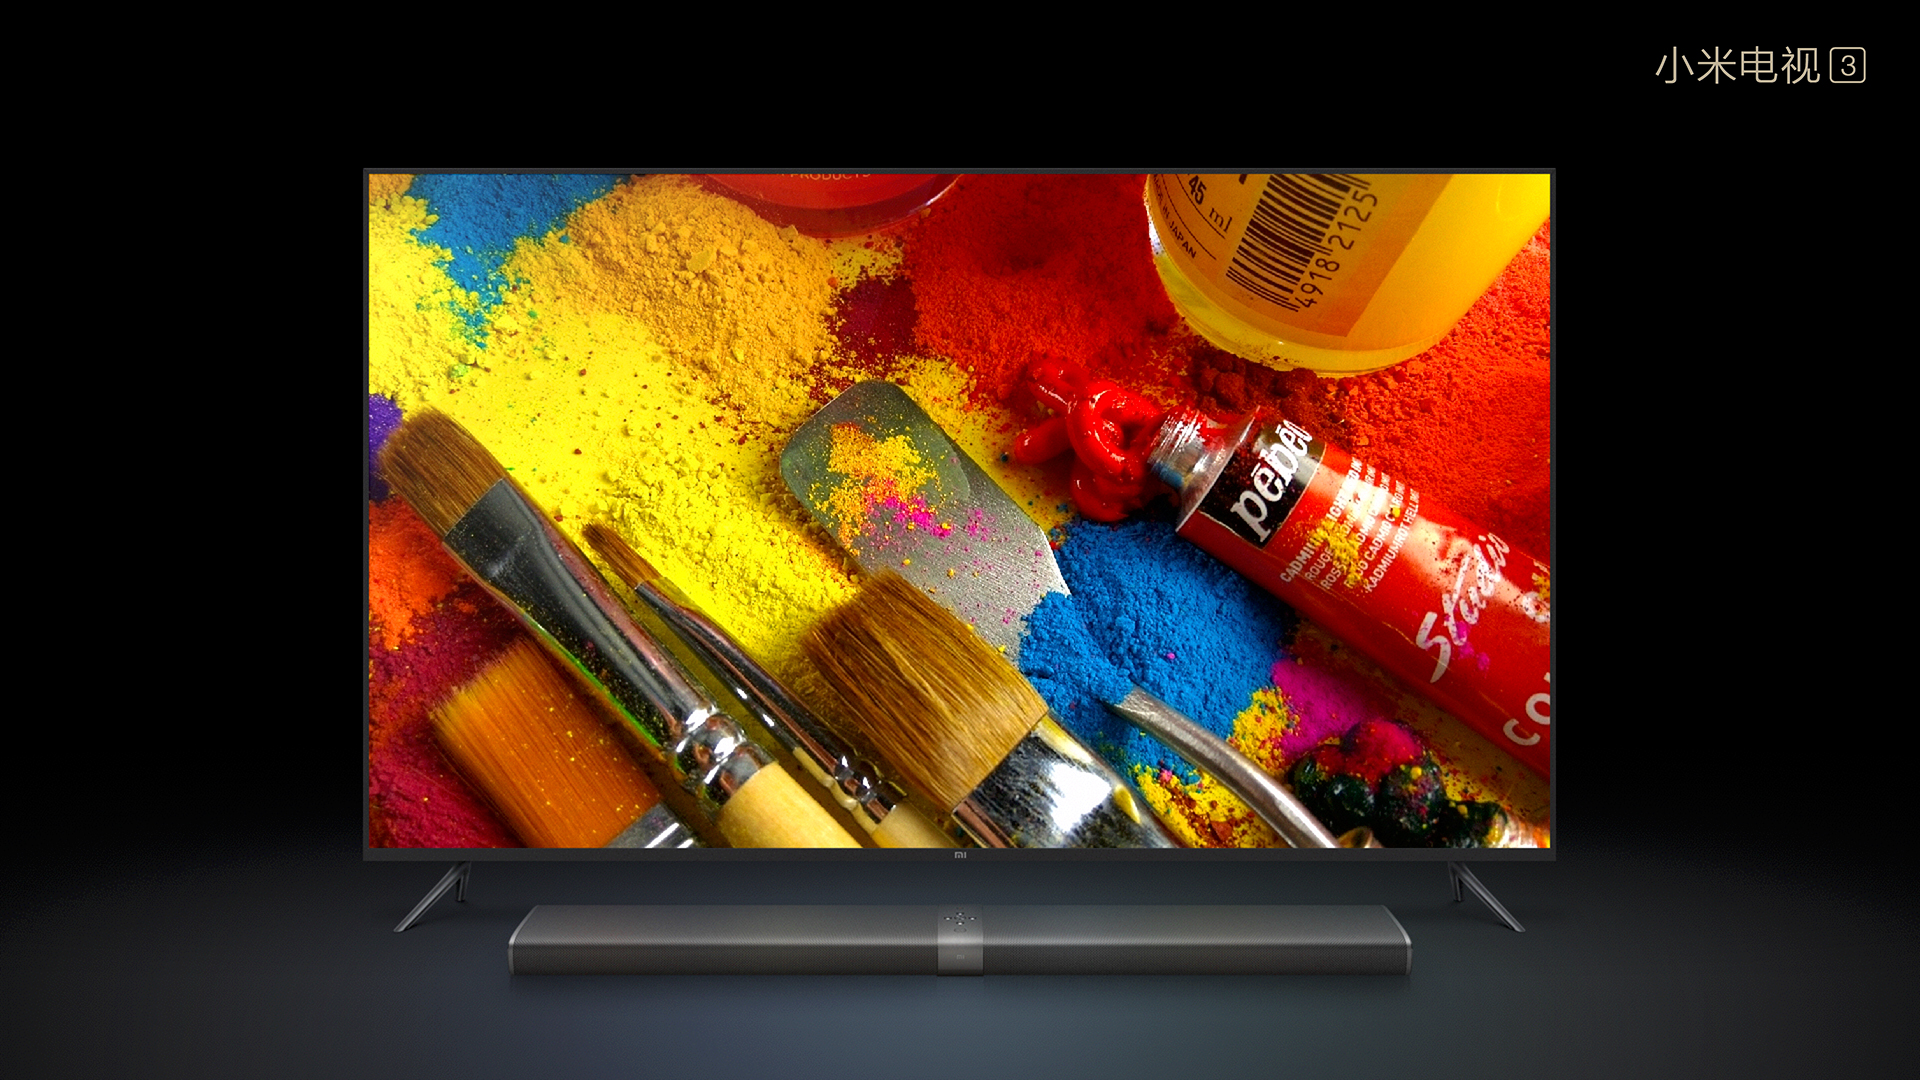 The Mi TV 3s 65-inch